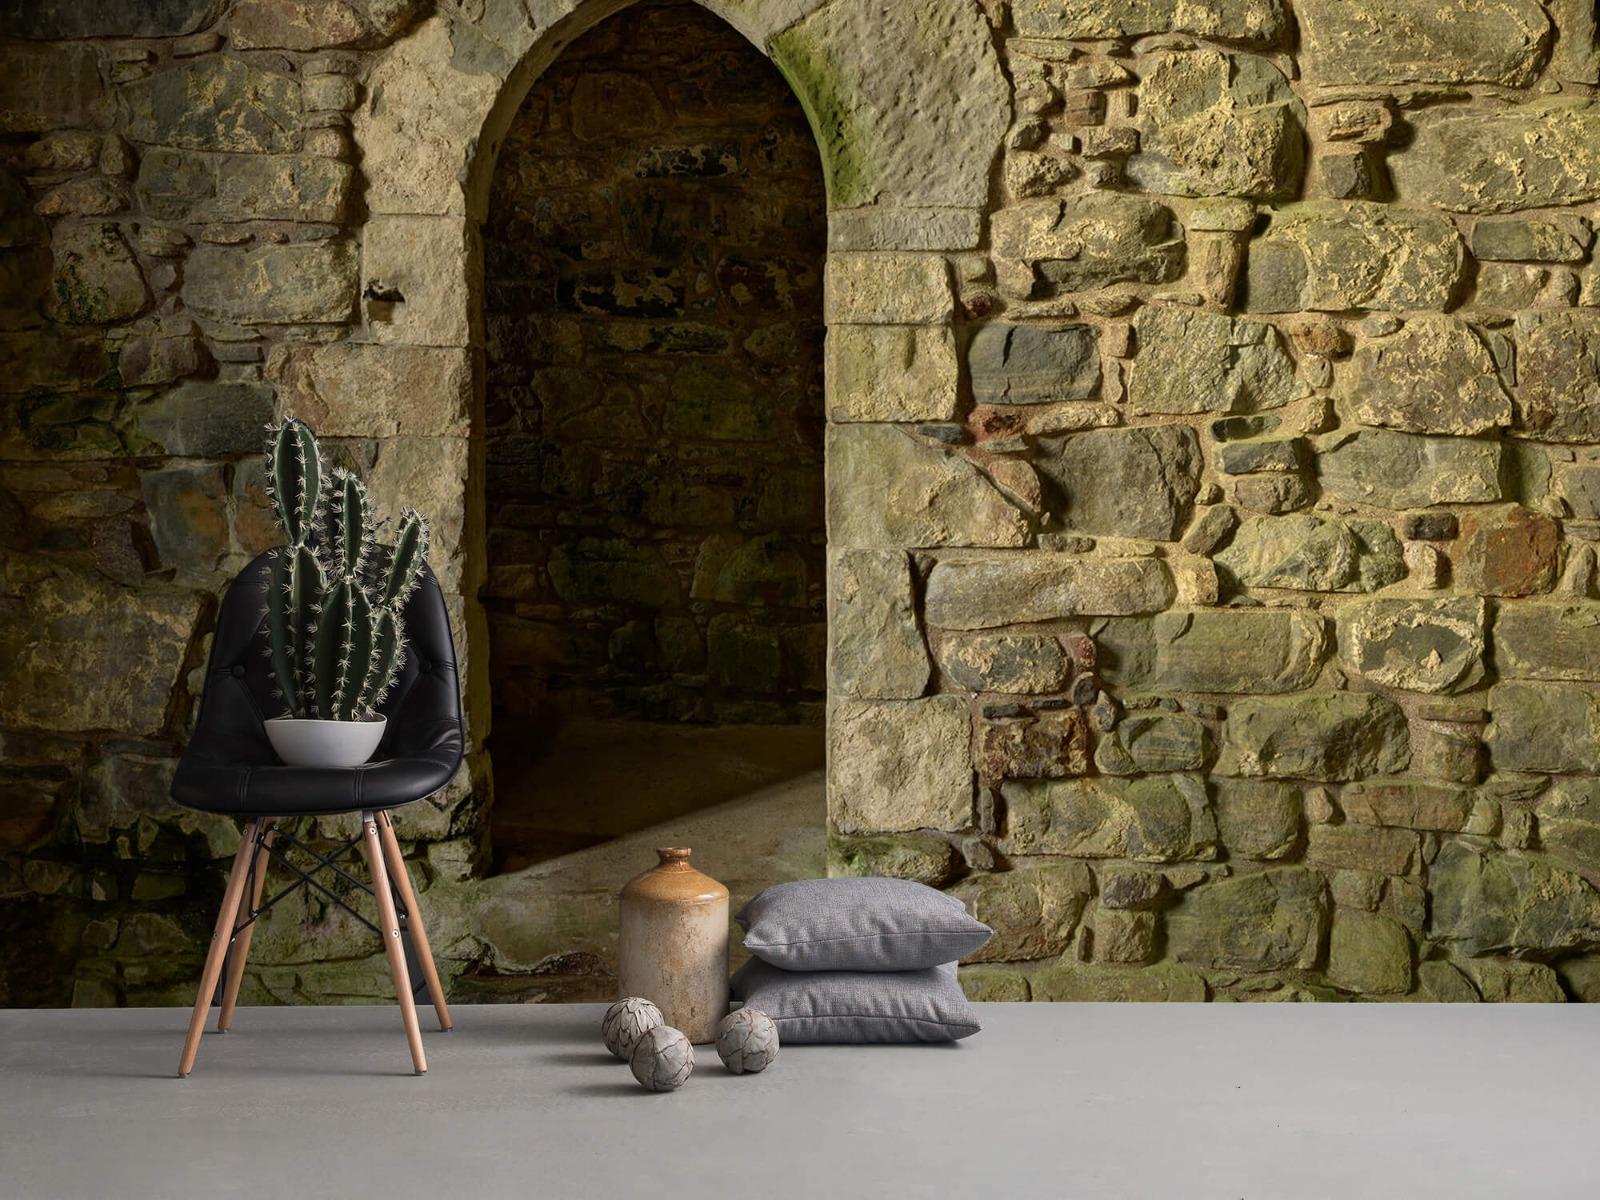 Steen behang - Oude muur met doorgang - Slaapkamer 1